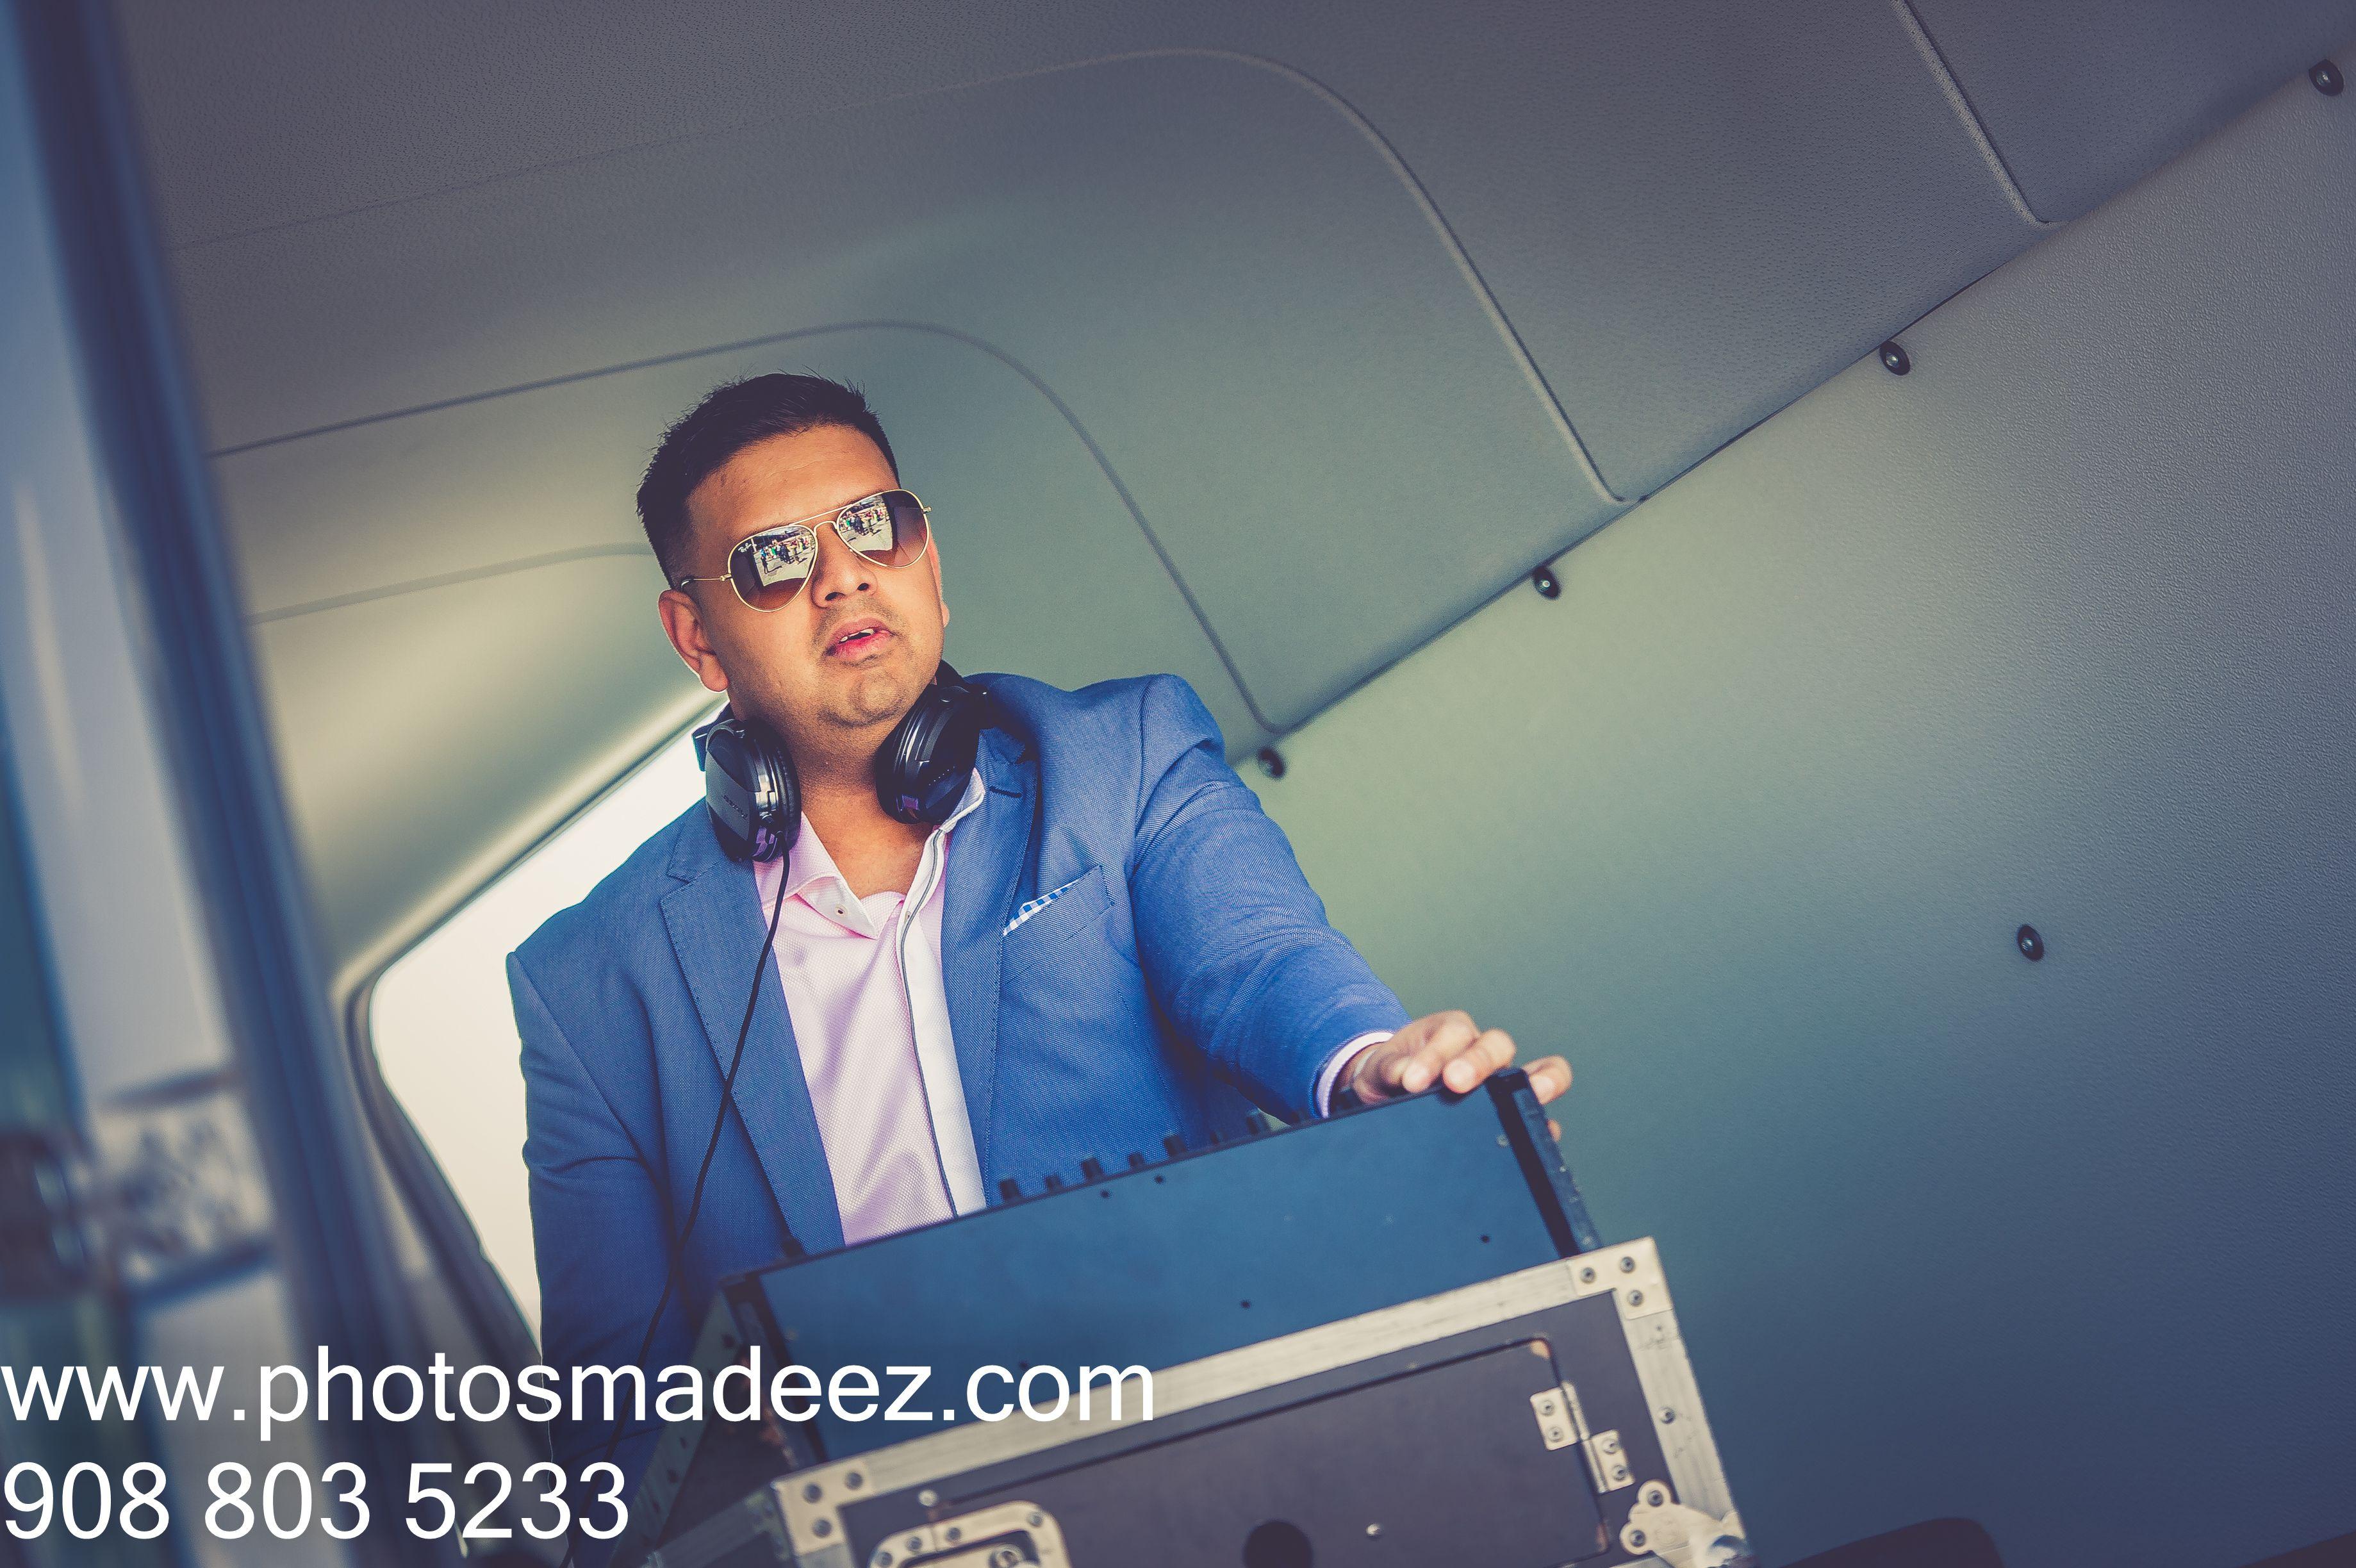 Baraat conducted by DJ Raj Entertaiment at Mahwah Sheraton